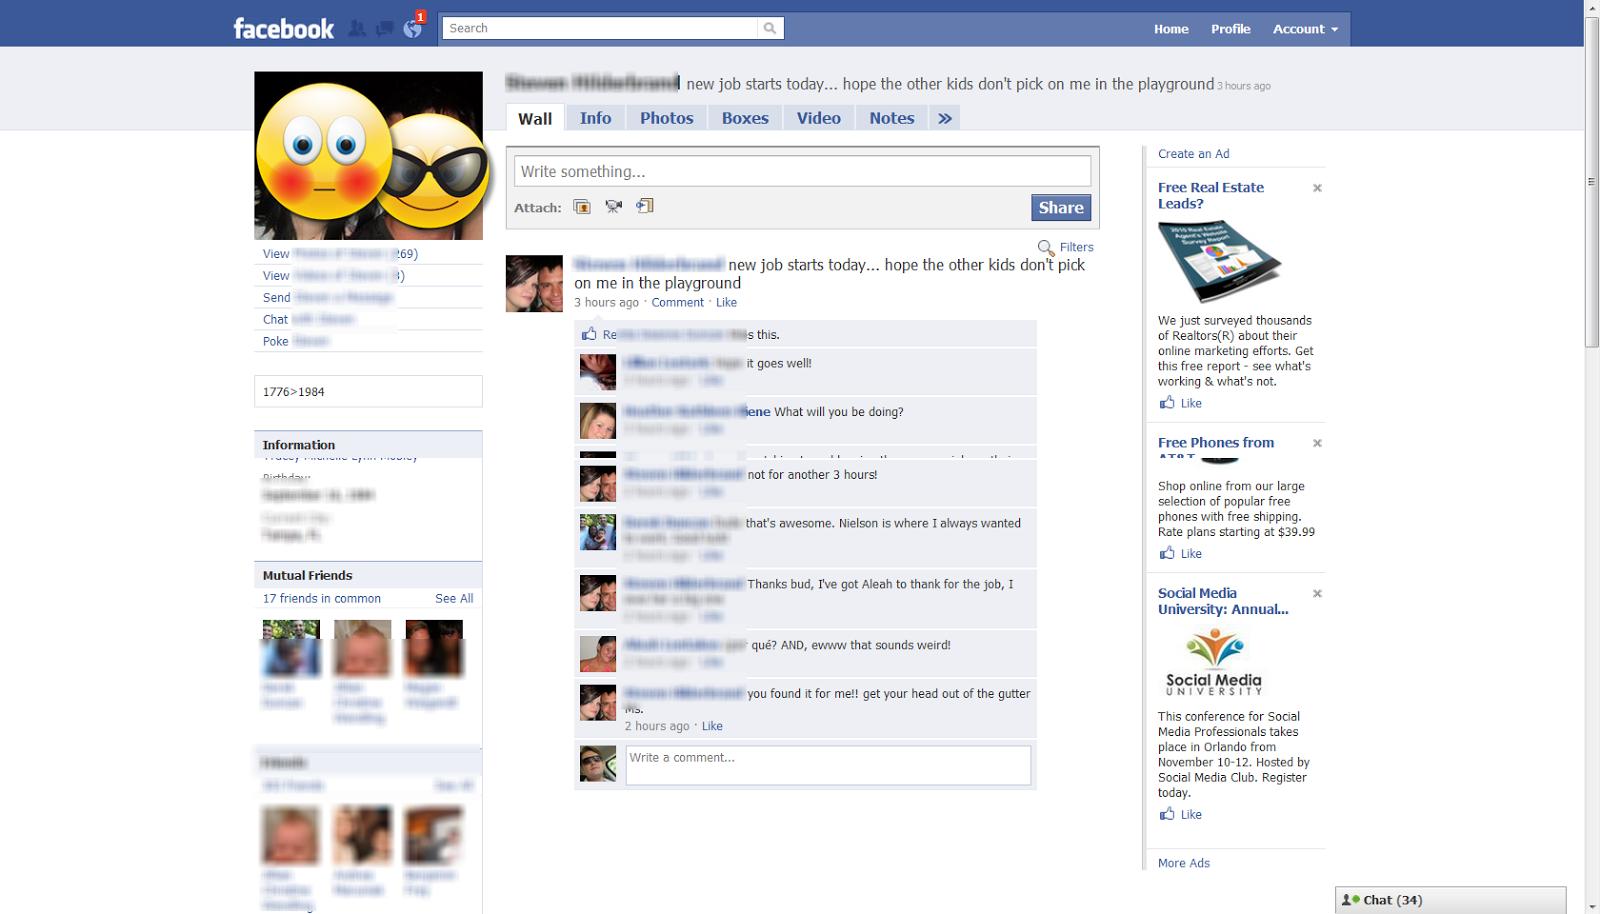 Kumpulan Status Facebook Lucu Terbaru 2014 Juragan Unyu